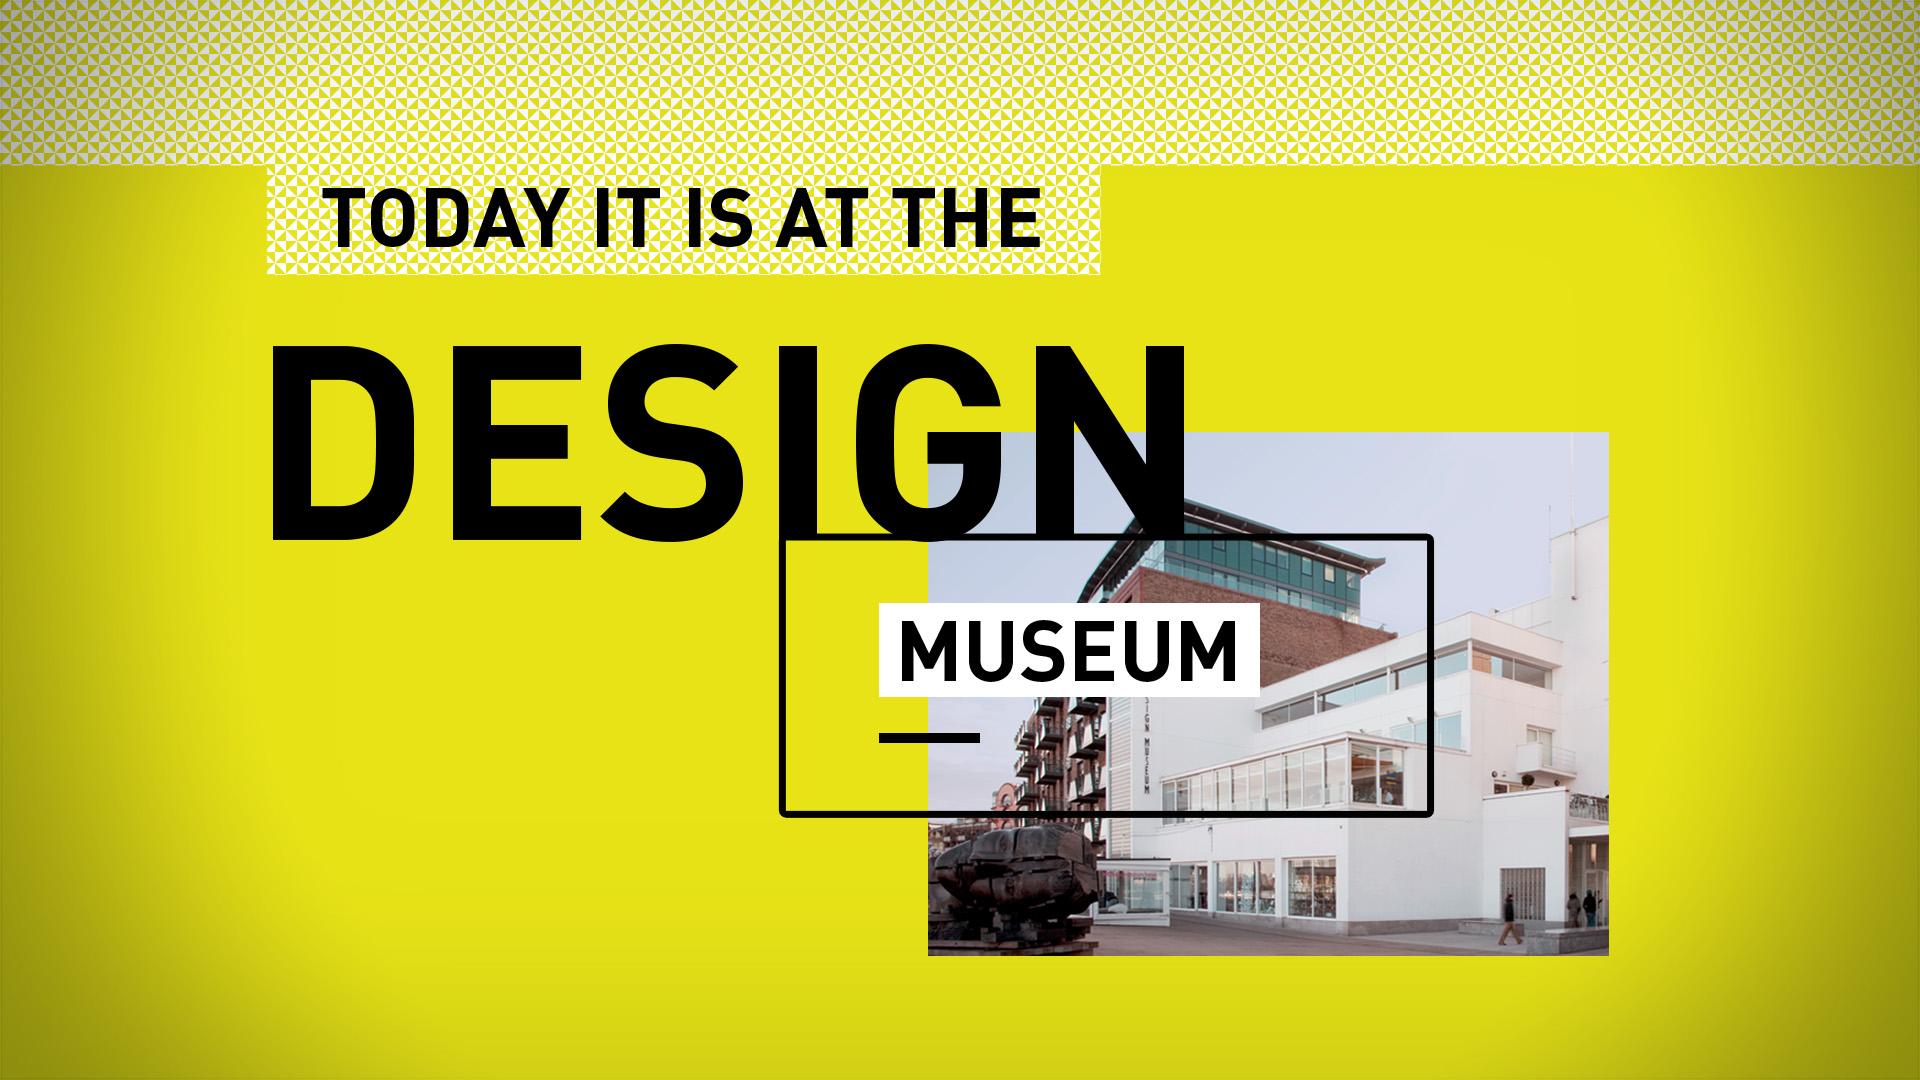 Design Museum - 2-28 copy